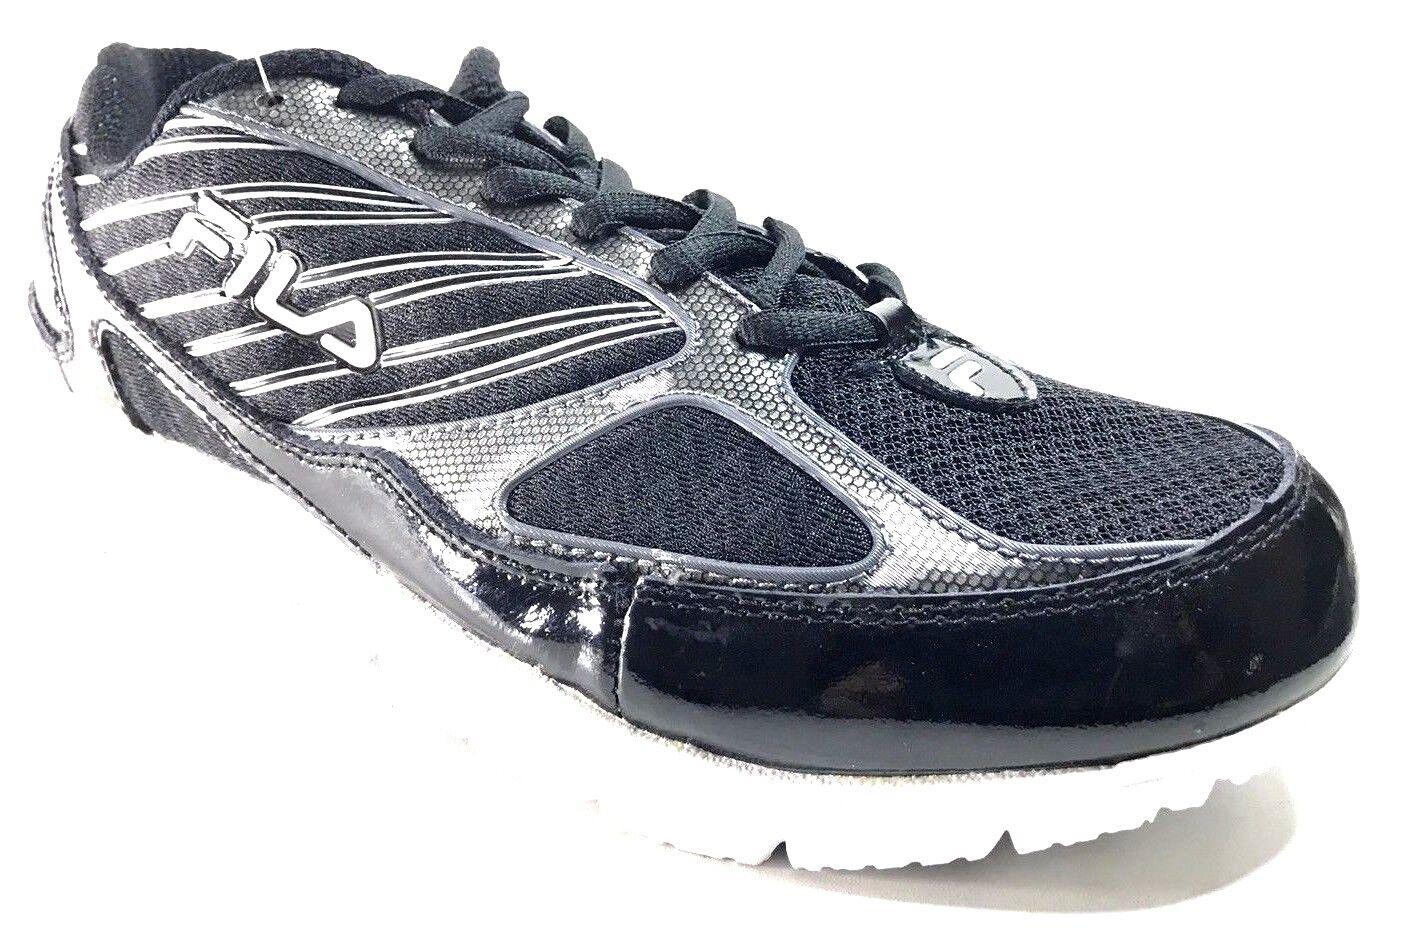 Fila Men's 2A Advanced Running shoes,Black White Metallic Silver,10 M US